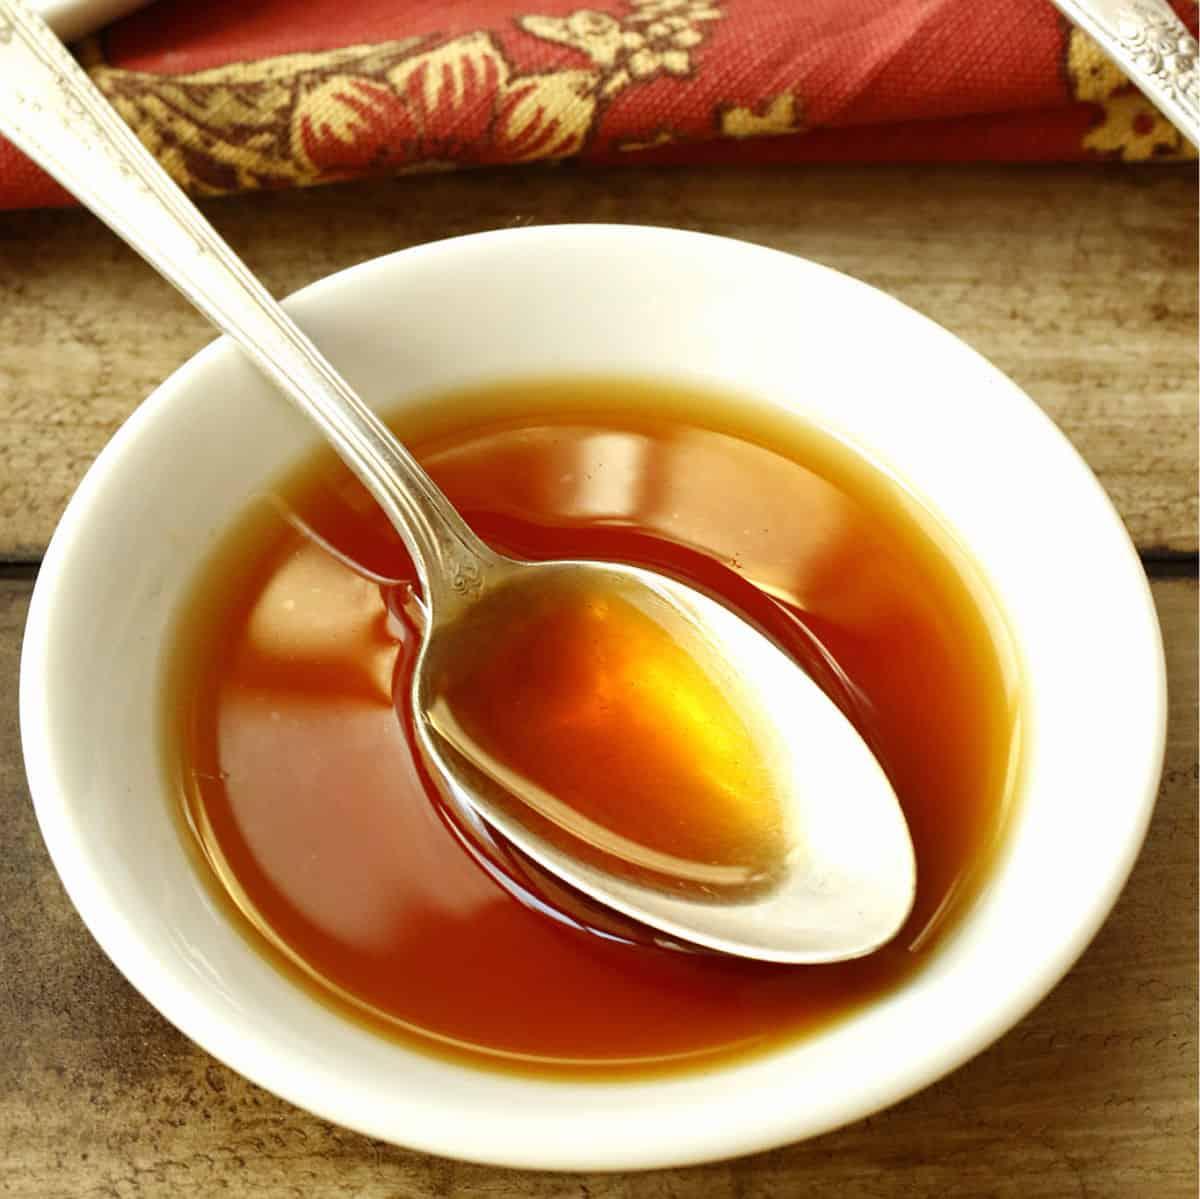 bowl of vanilla extract